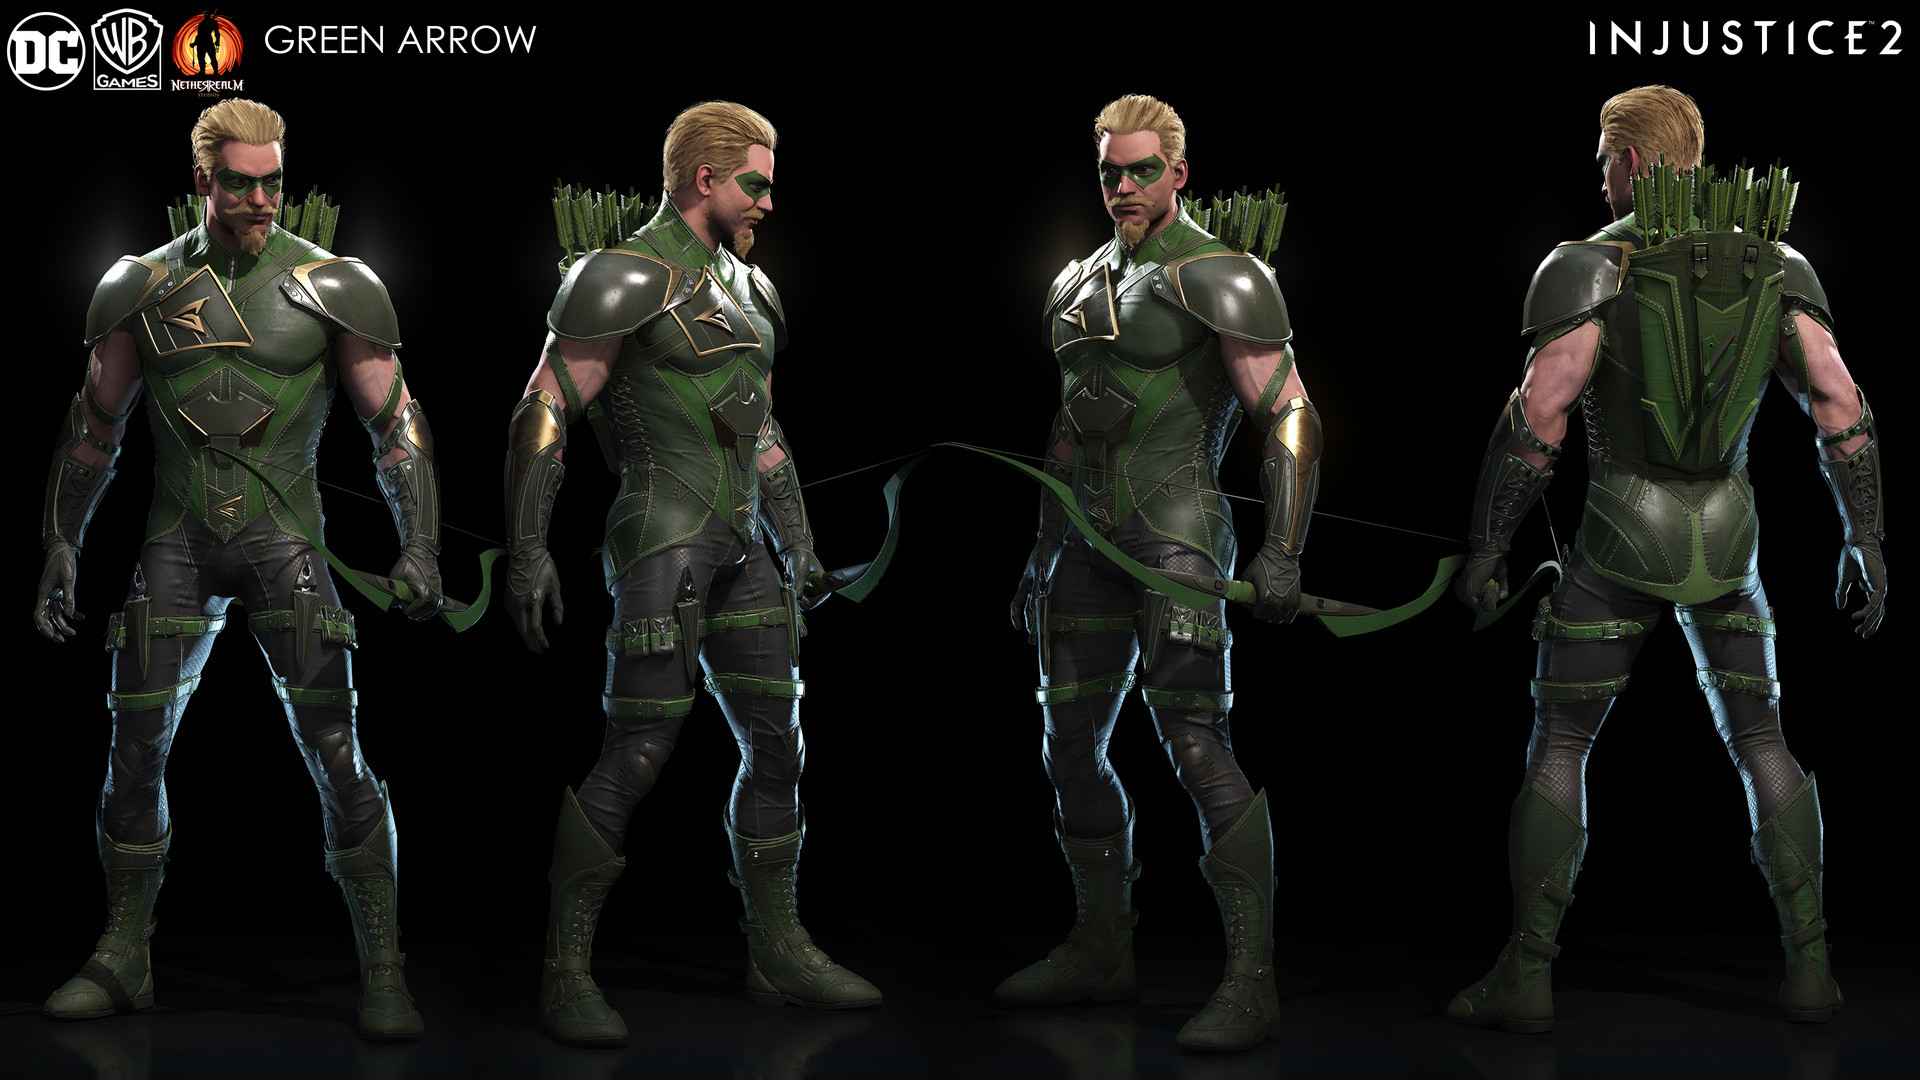 Injustice 2- Green Arrow Game asset